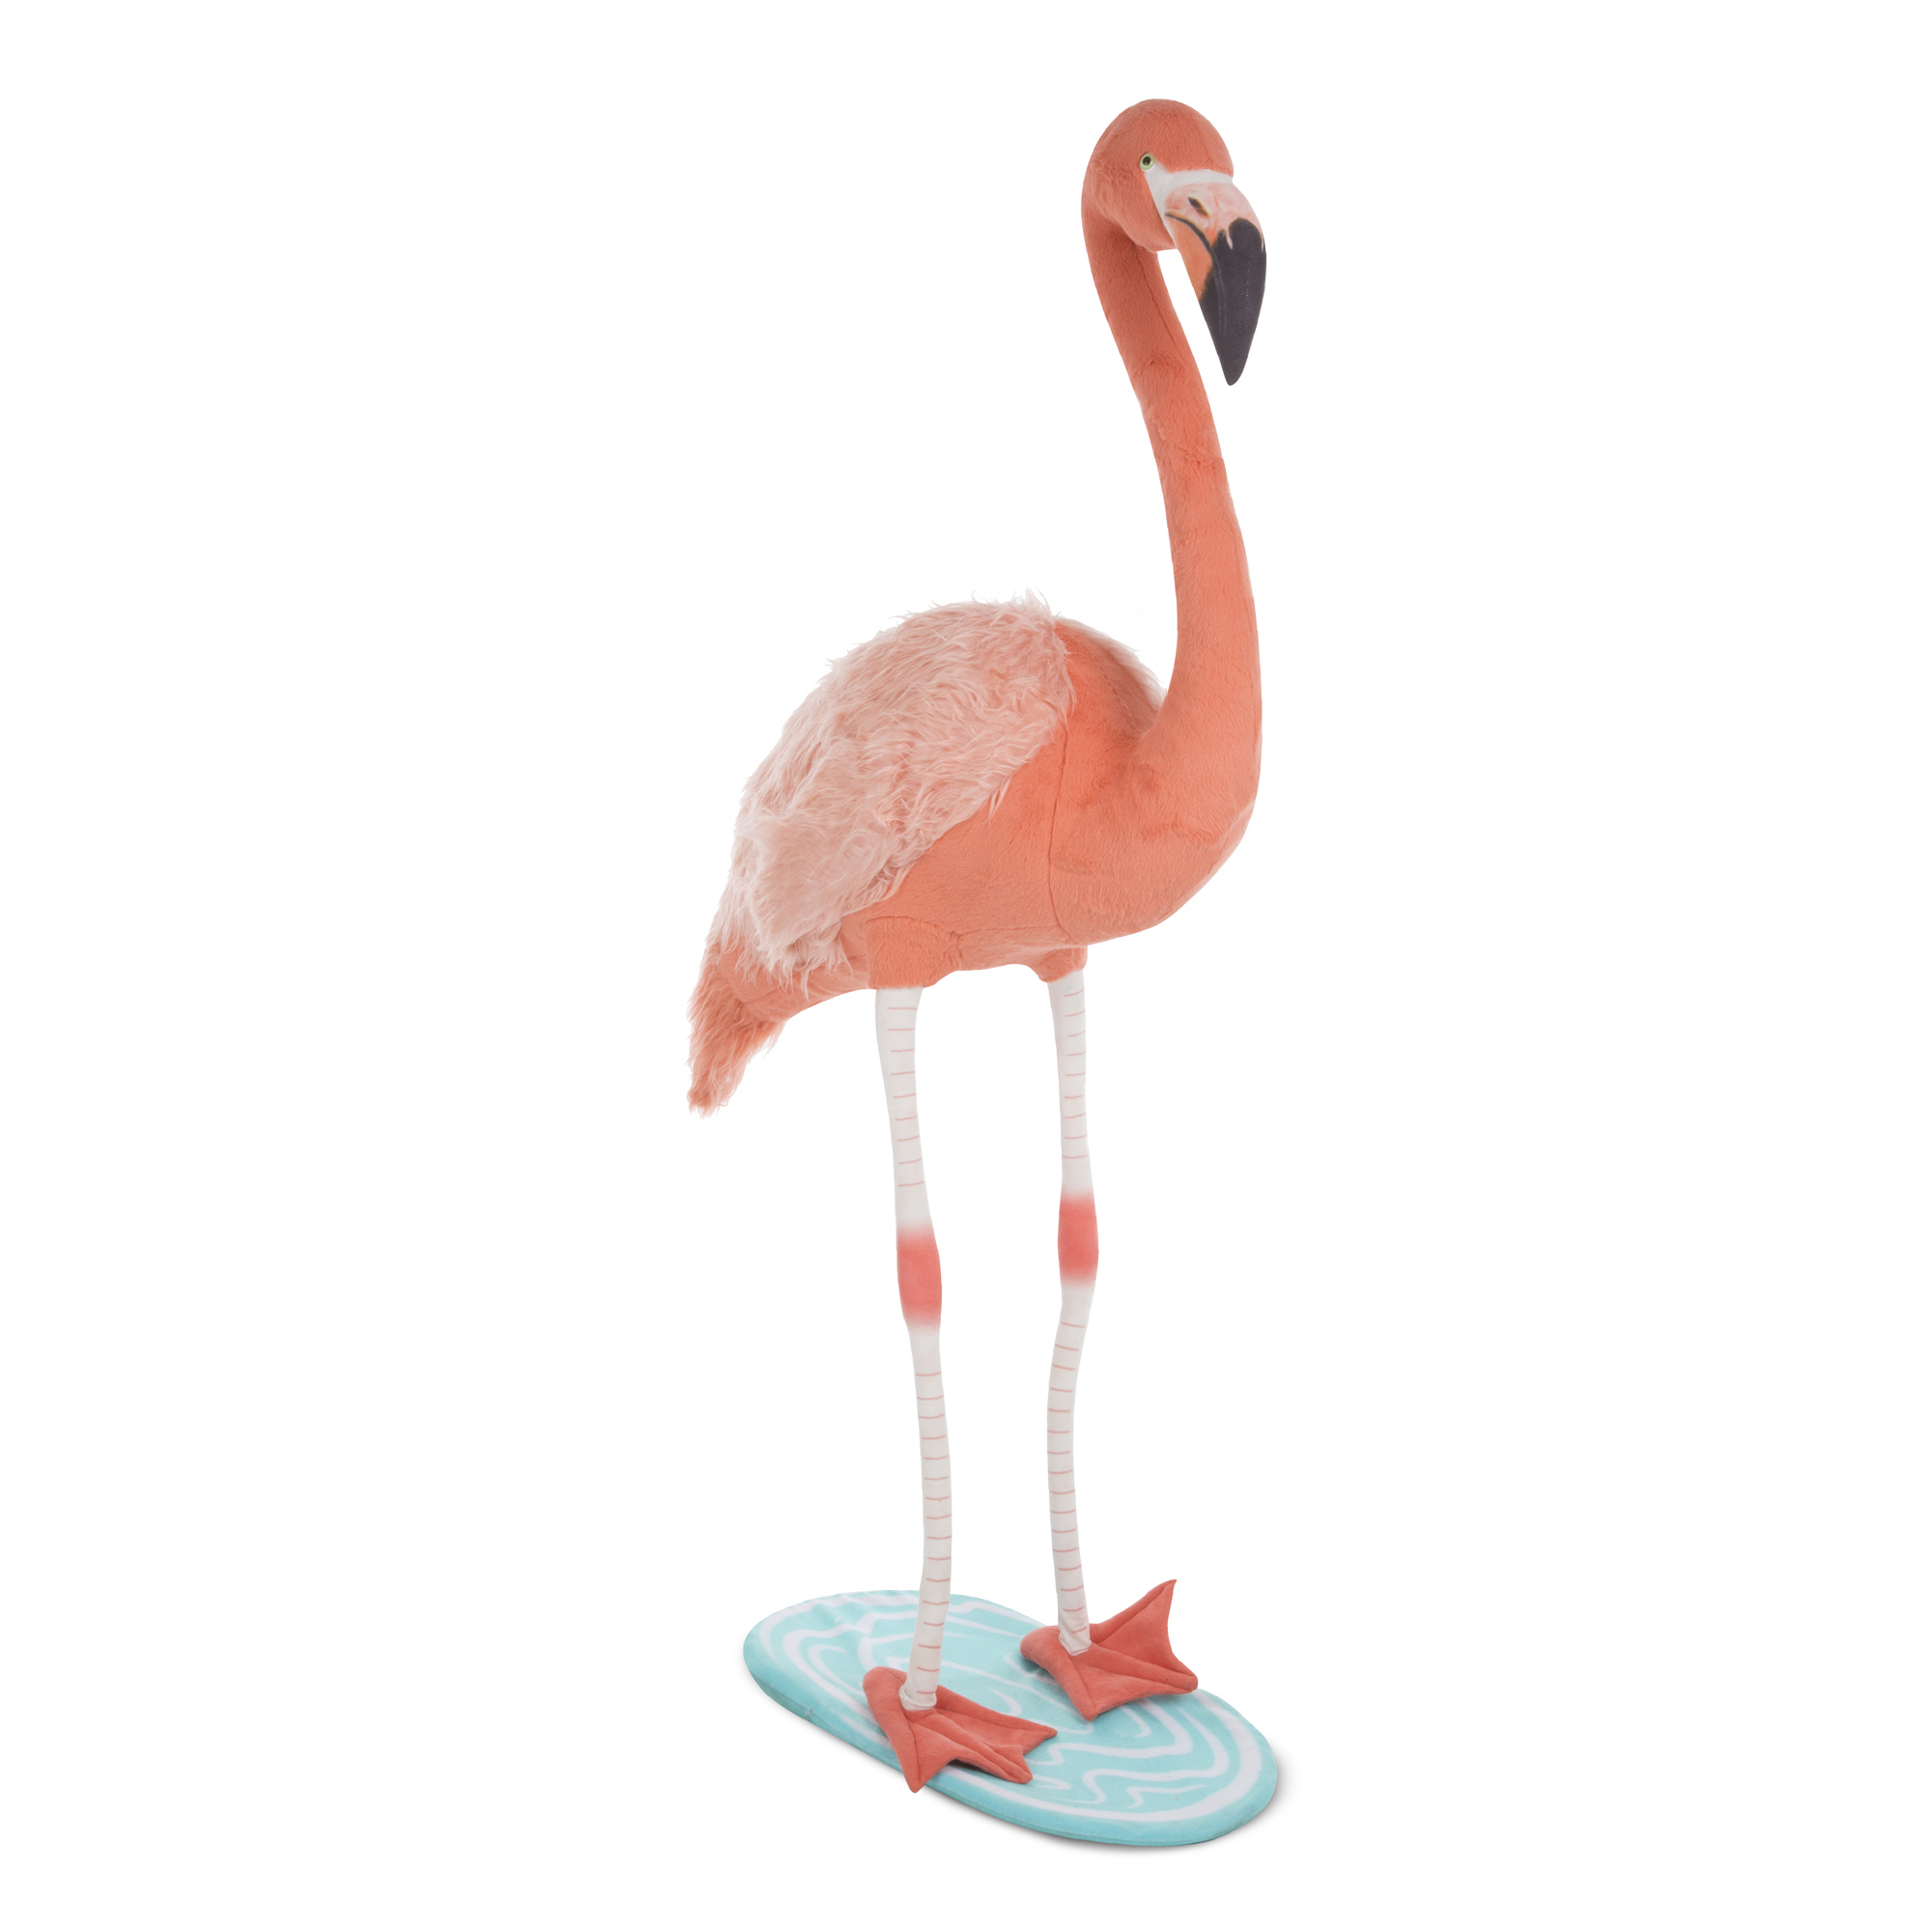 Мягкая игрушка – Фламинго, 130 см. по цене 11 810